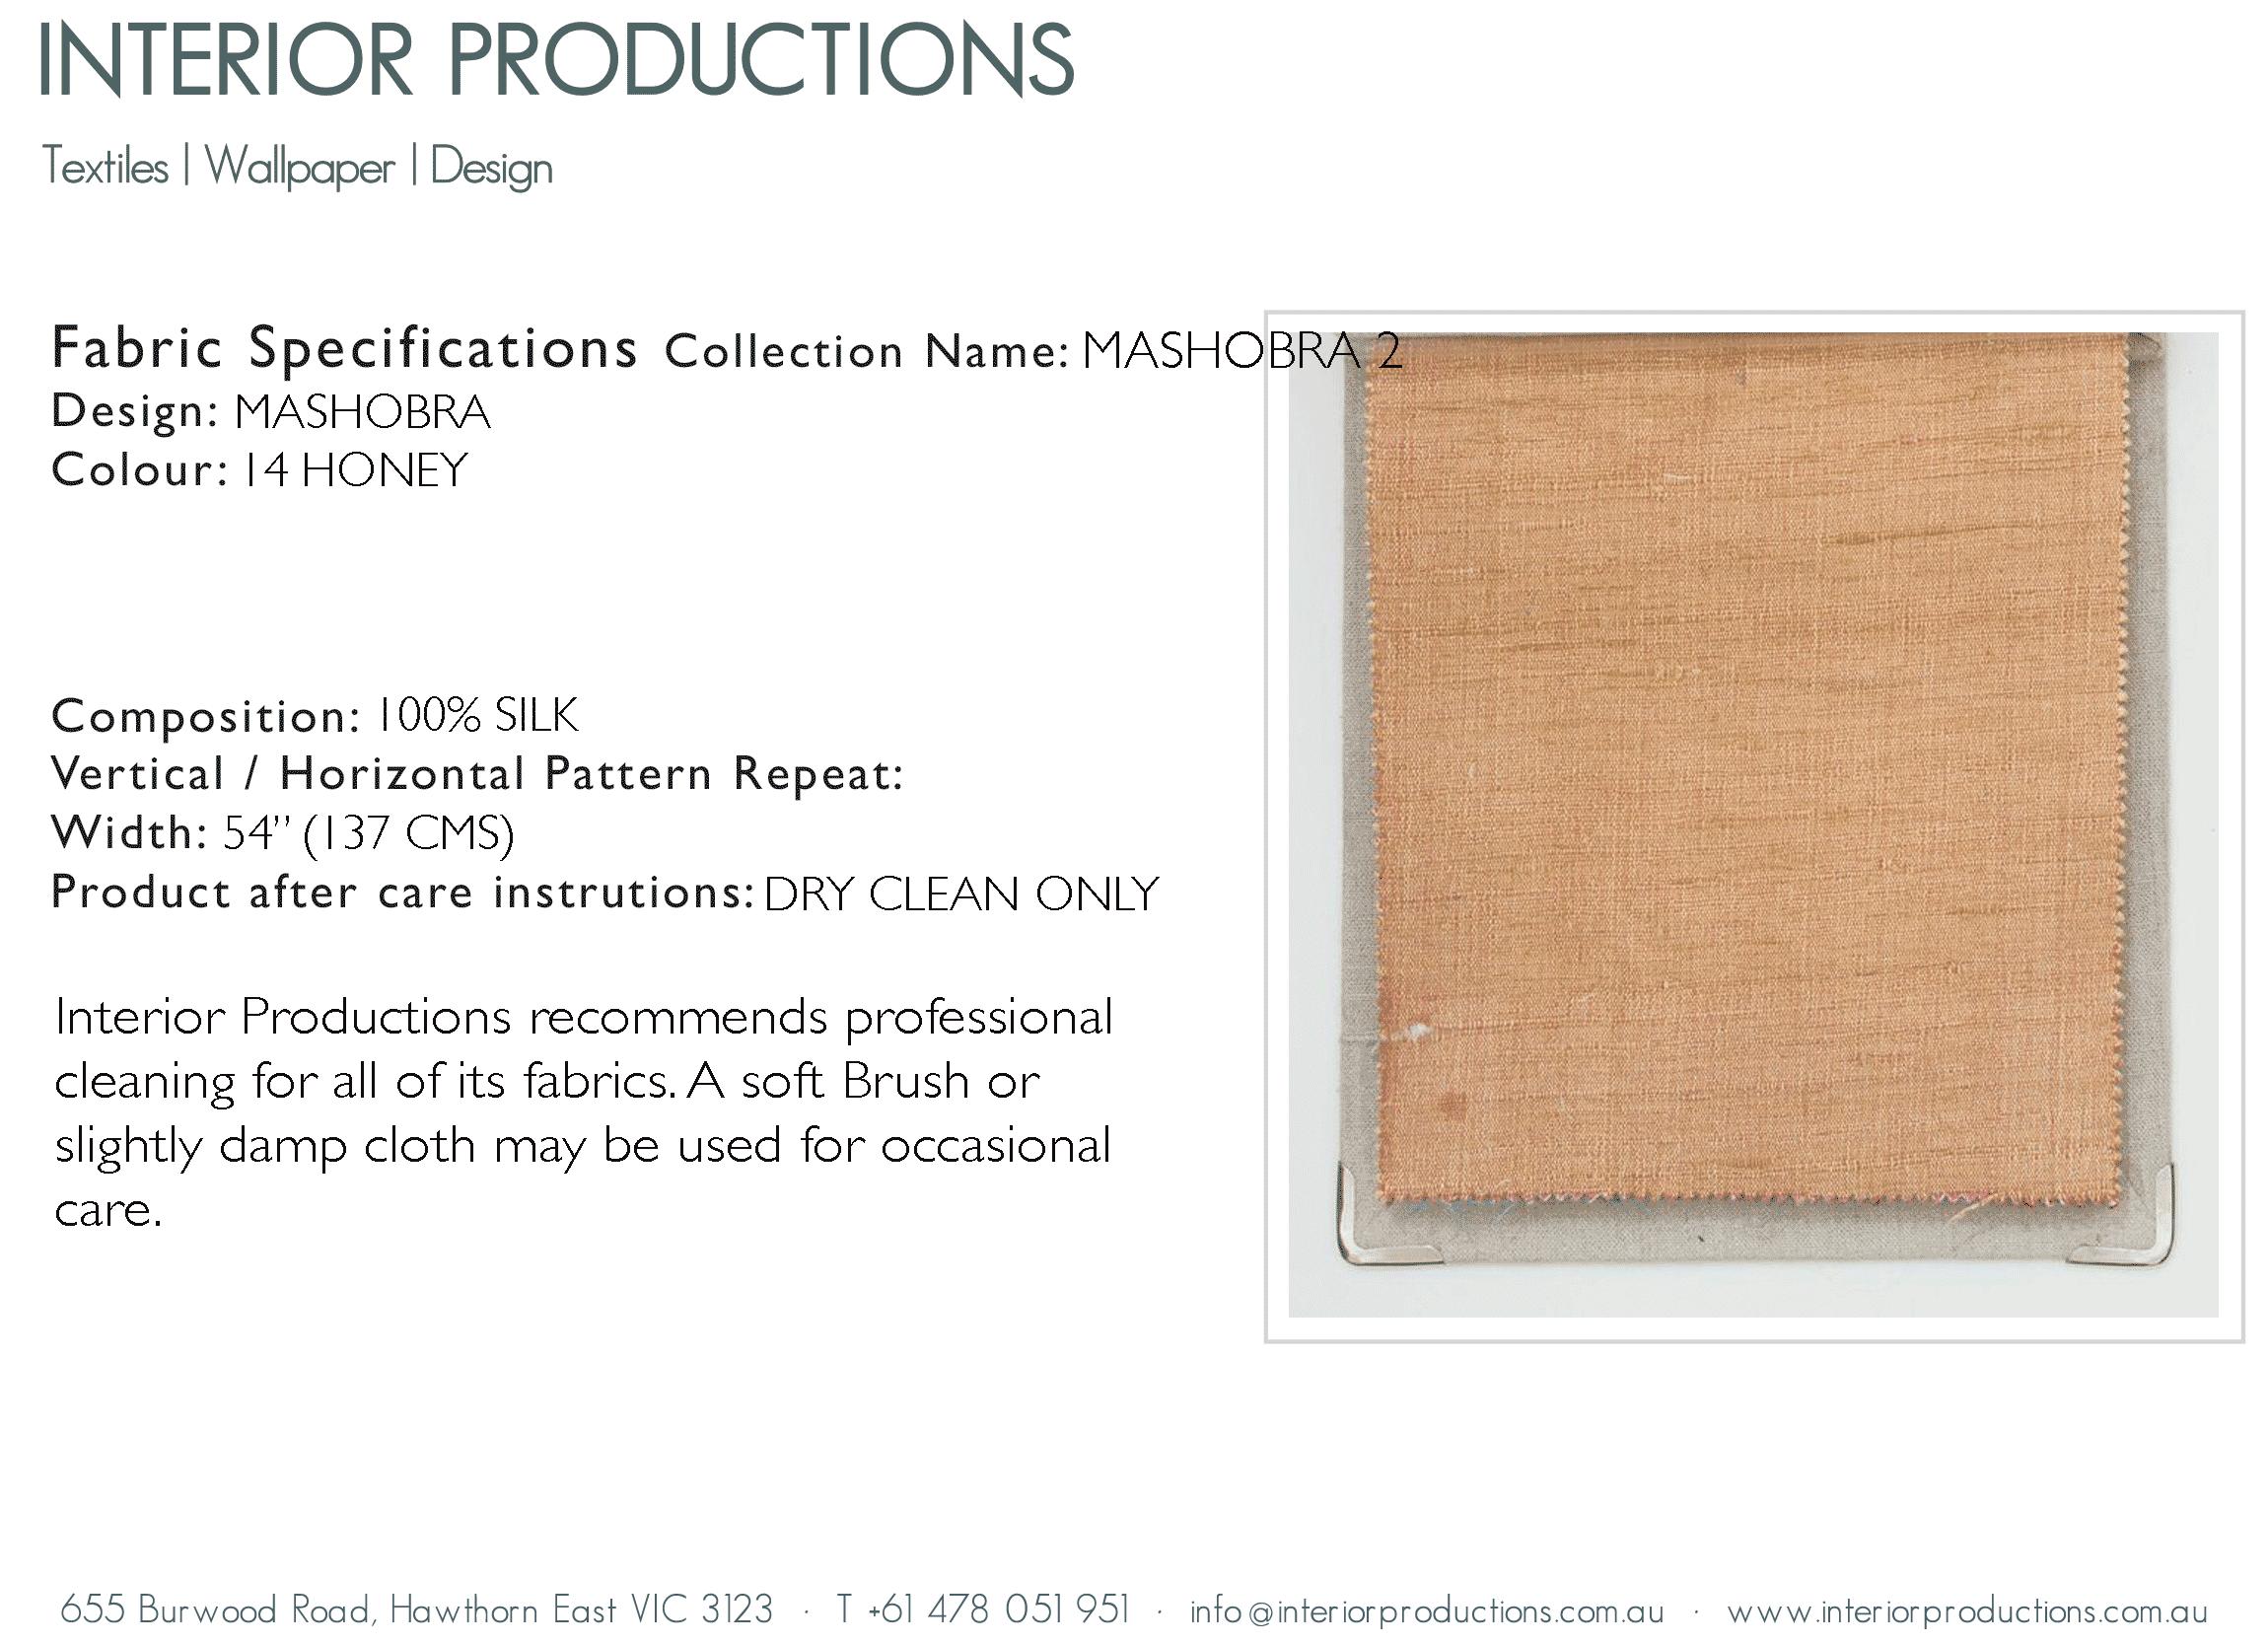 interior_productions_MASHOBRA---14-HONEY